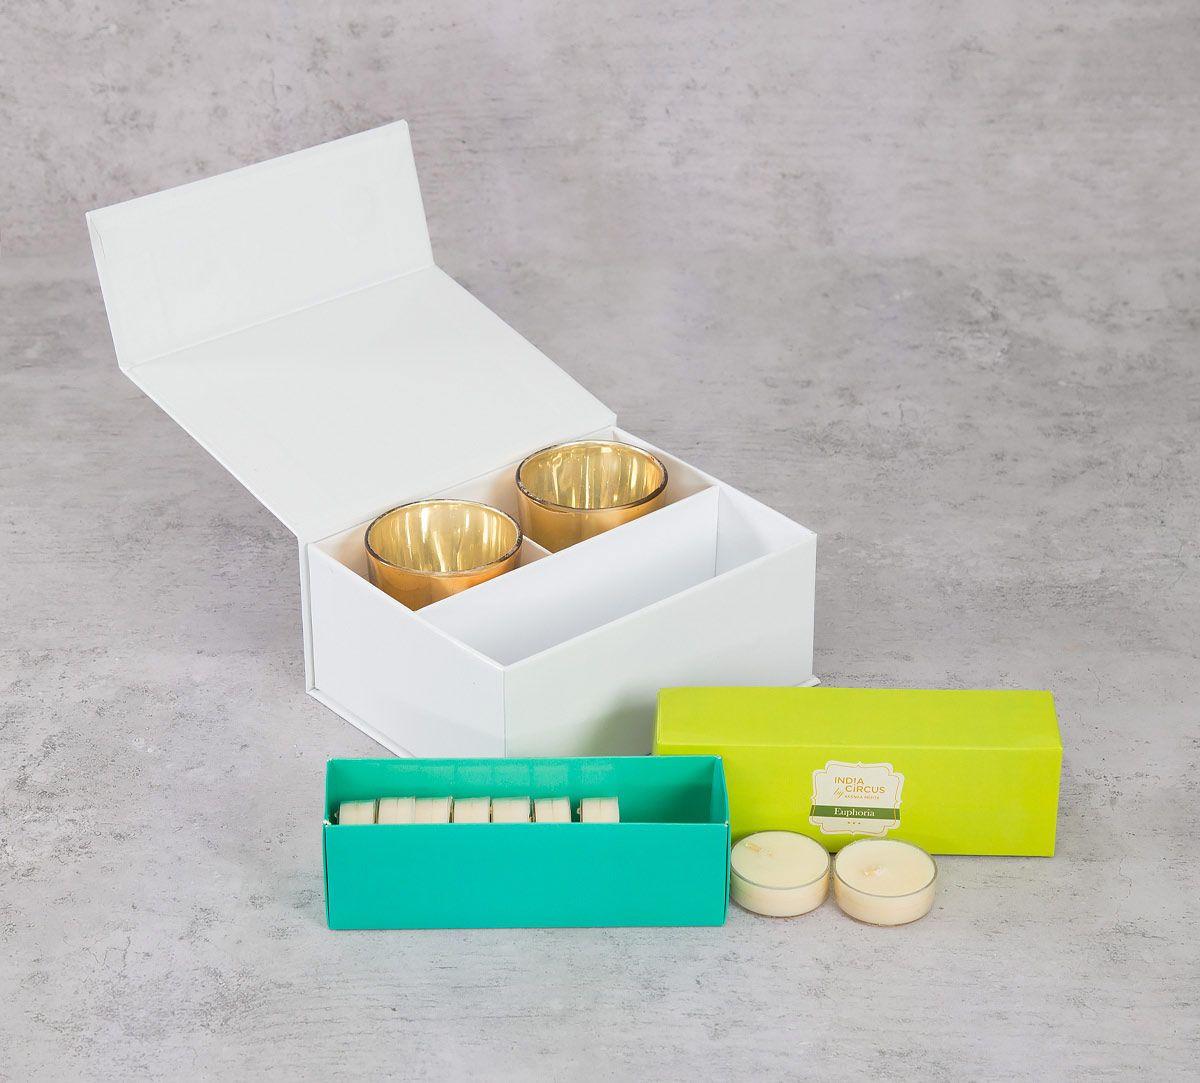 India Circus Golden Glass Votives Gift Box (Set of 2)